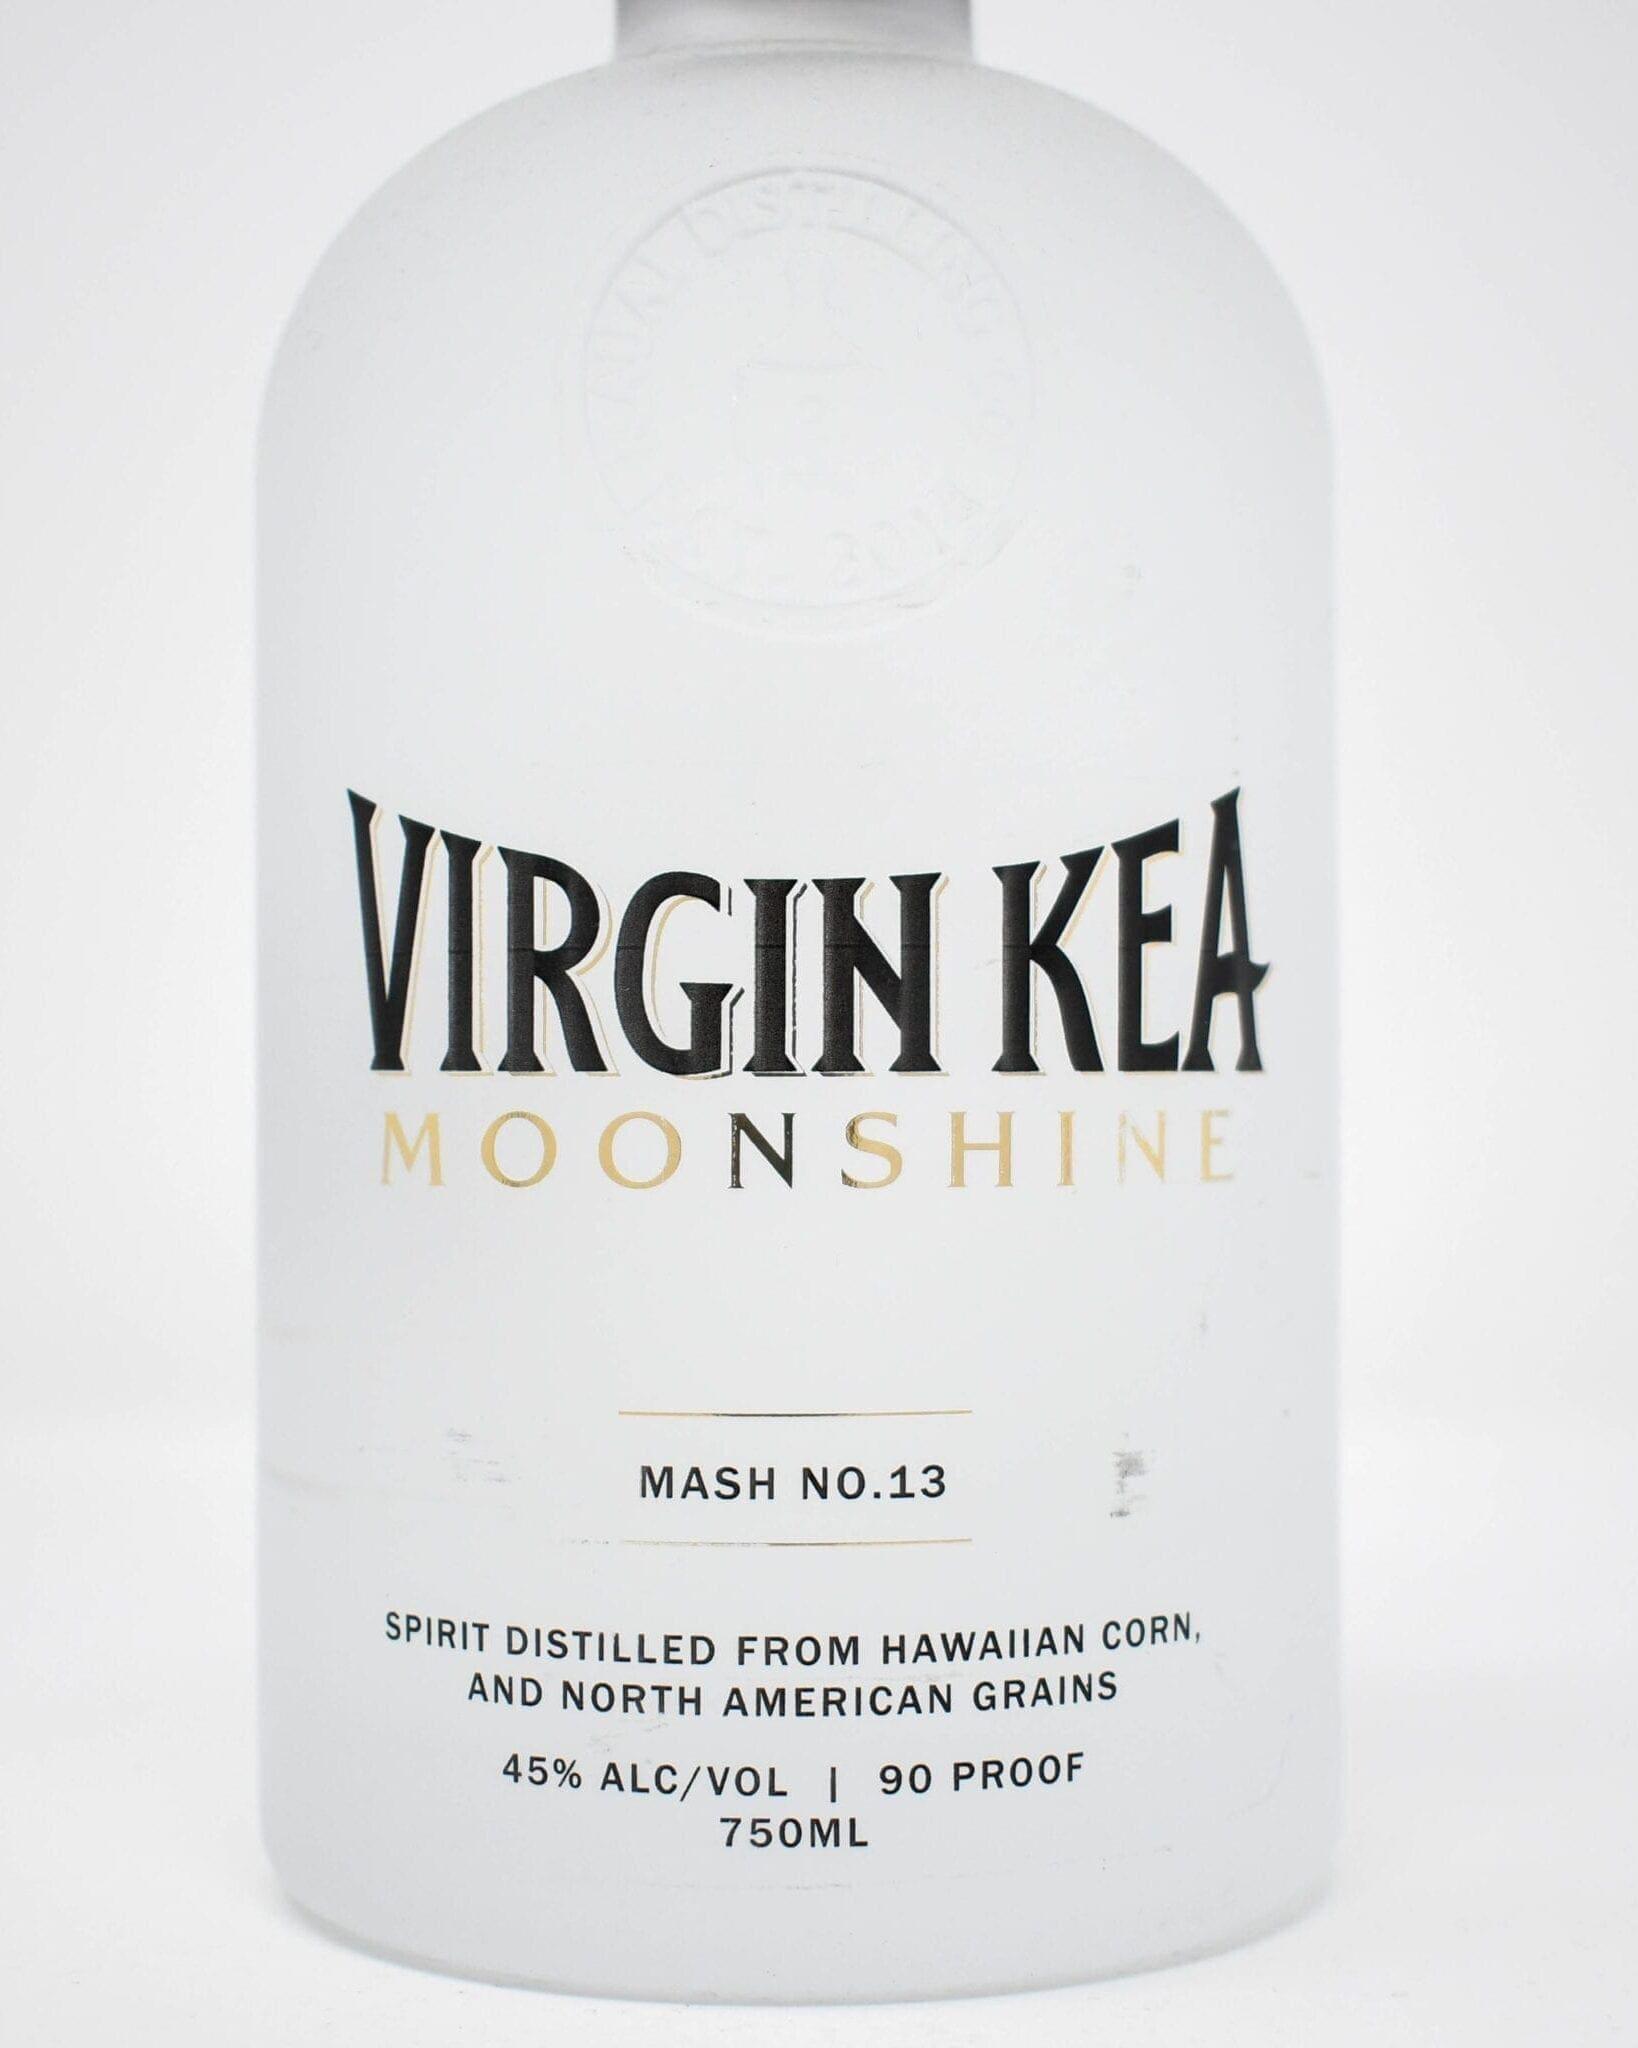 Virgin Kea Moonshine 750ml